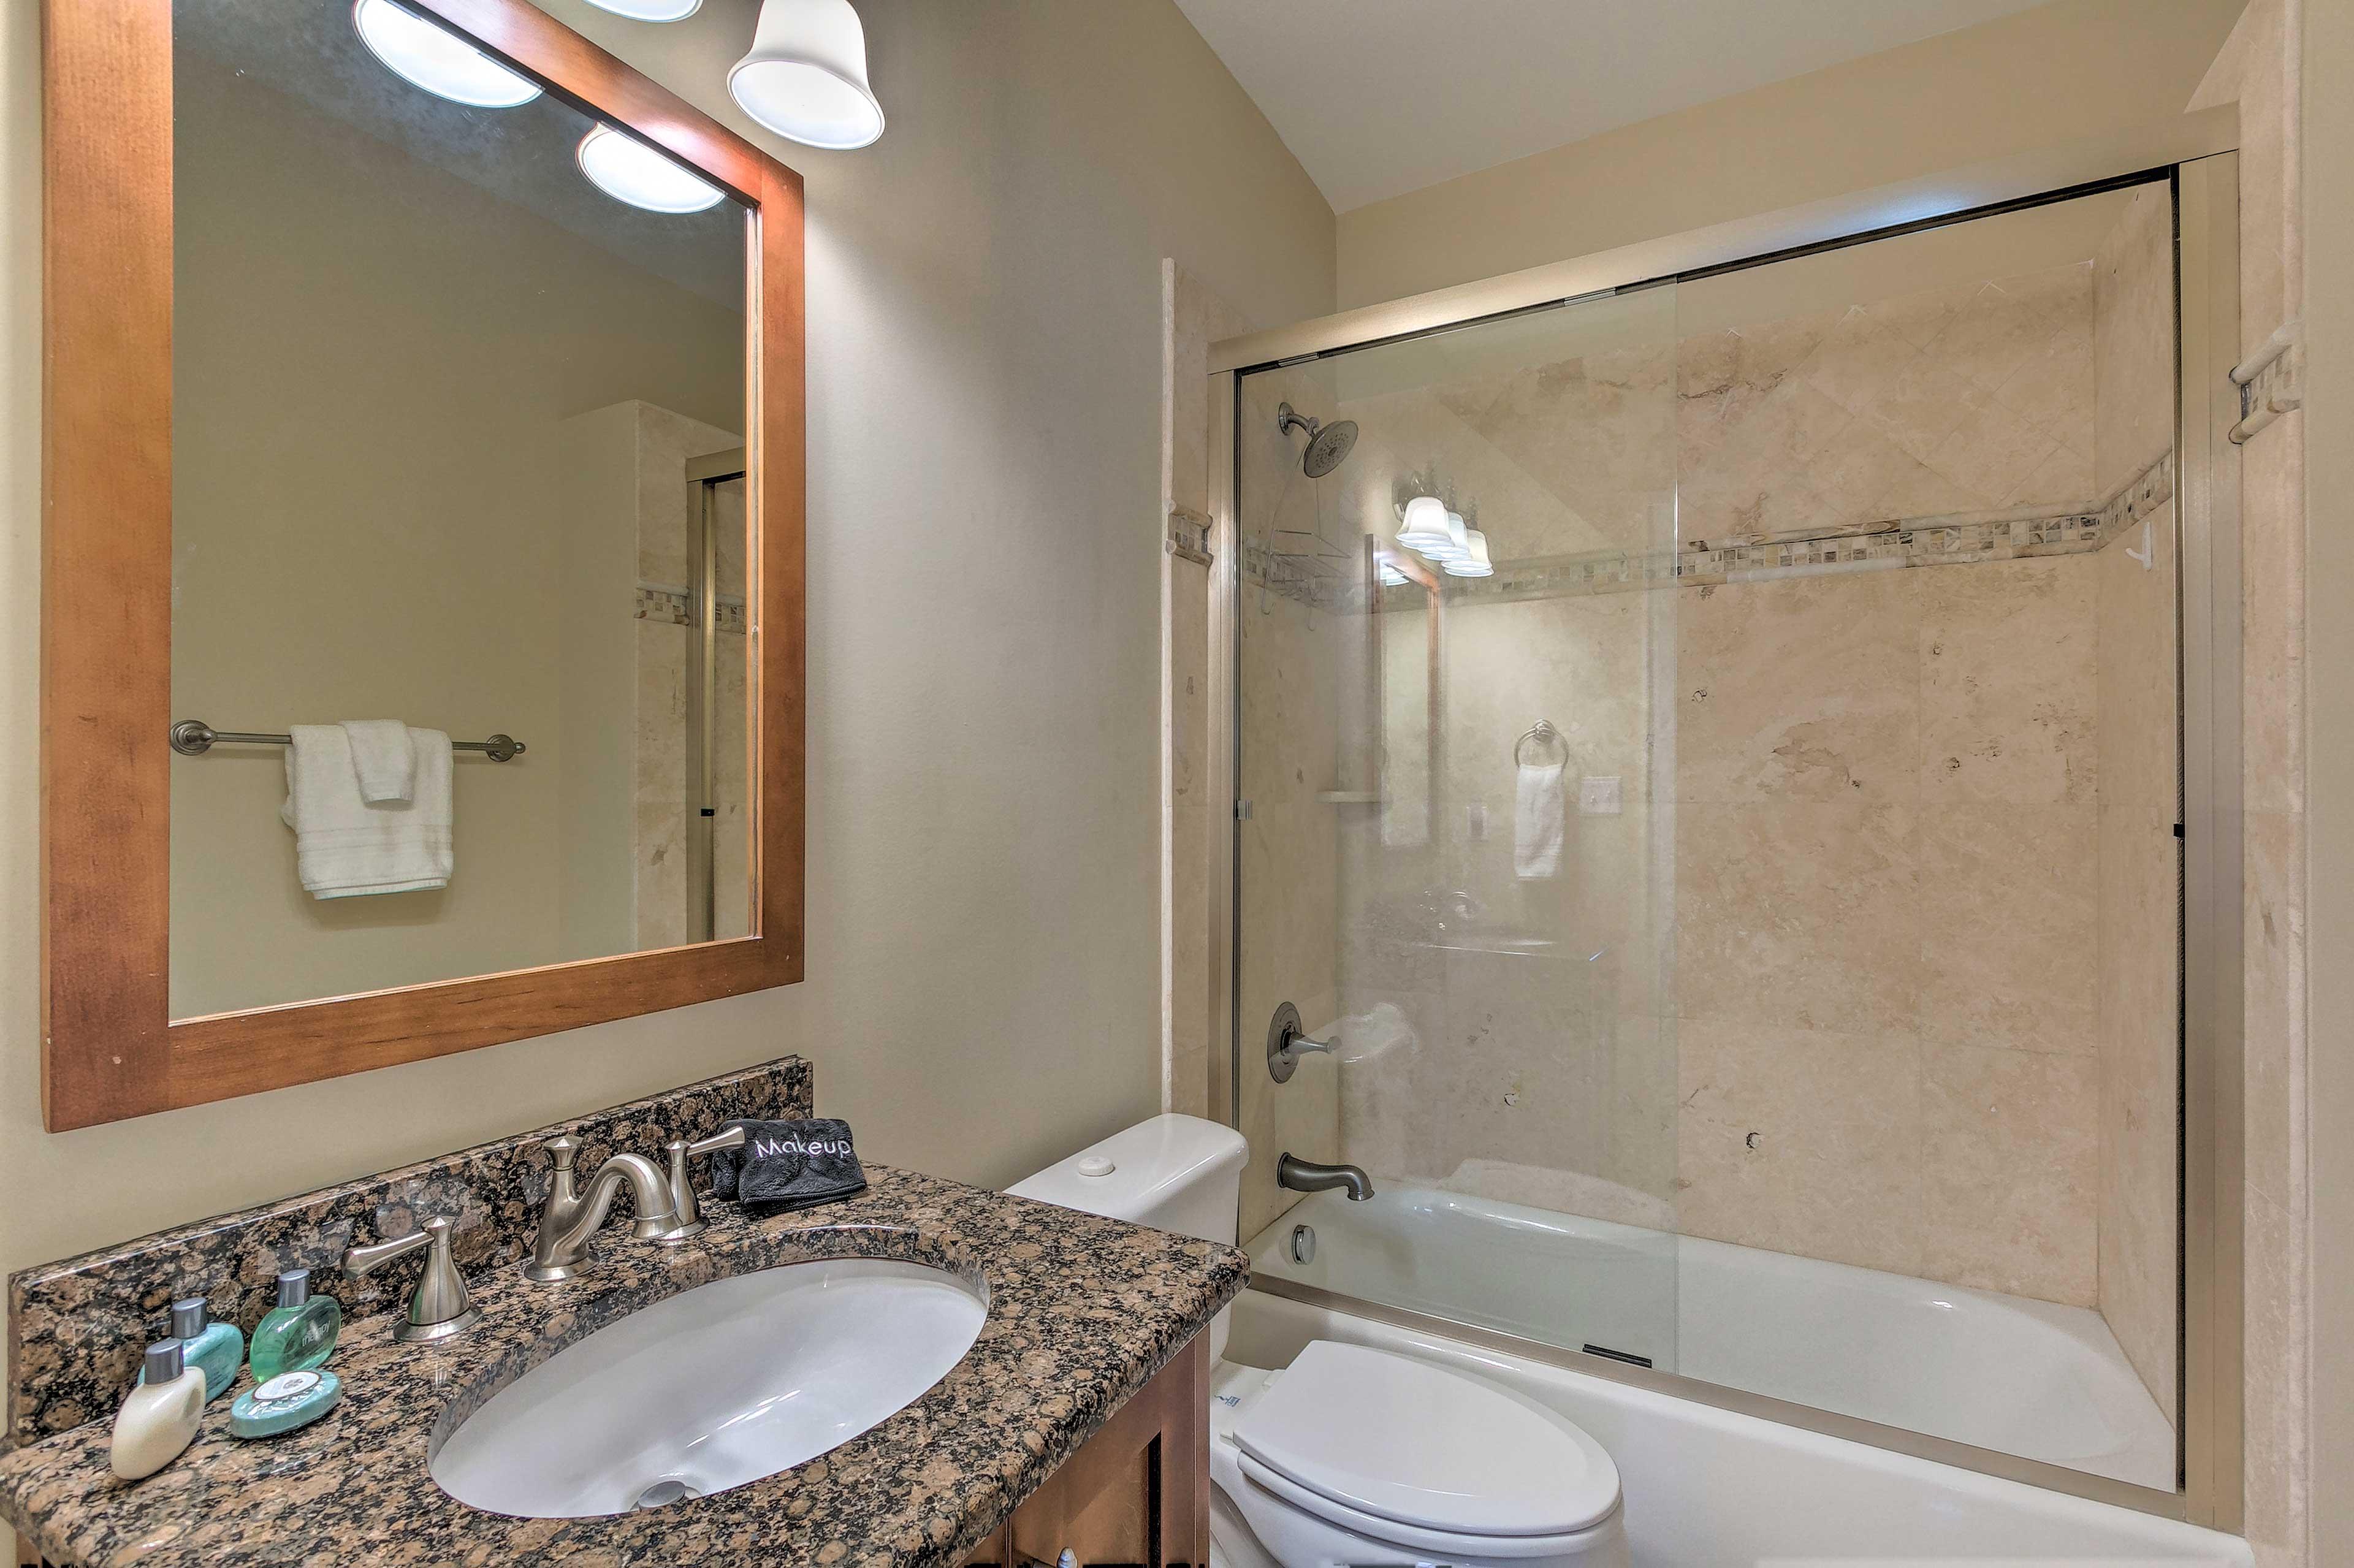 Rinse away the day in the en-suite bathroom.